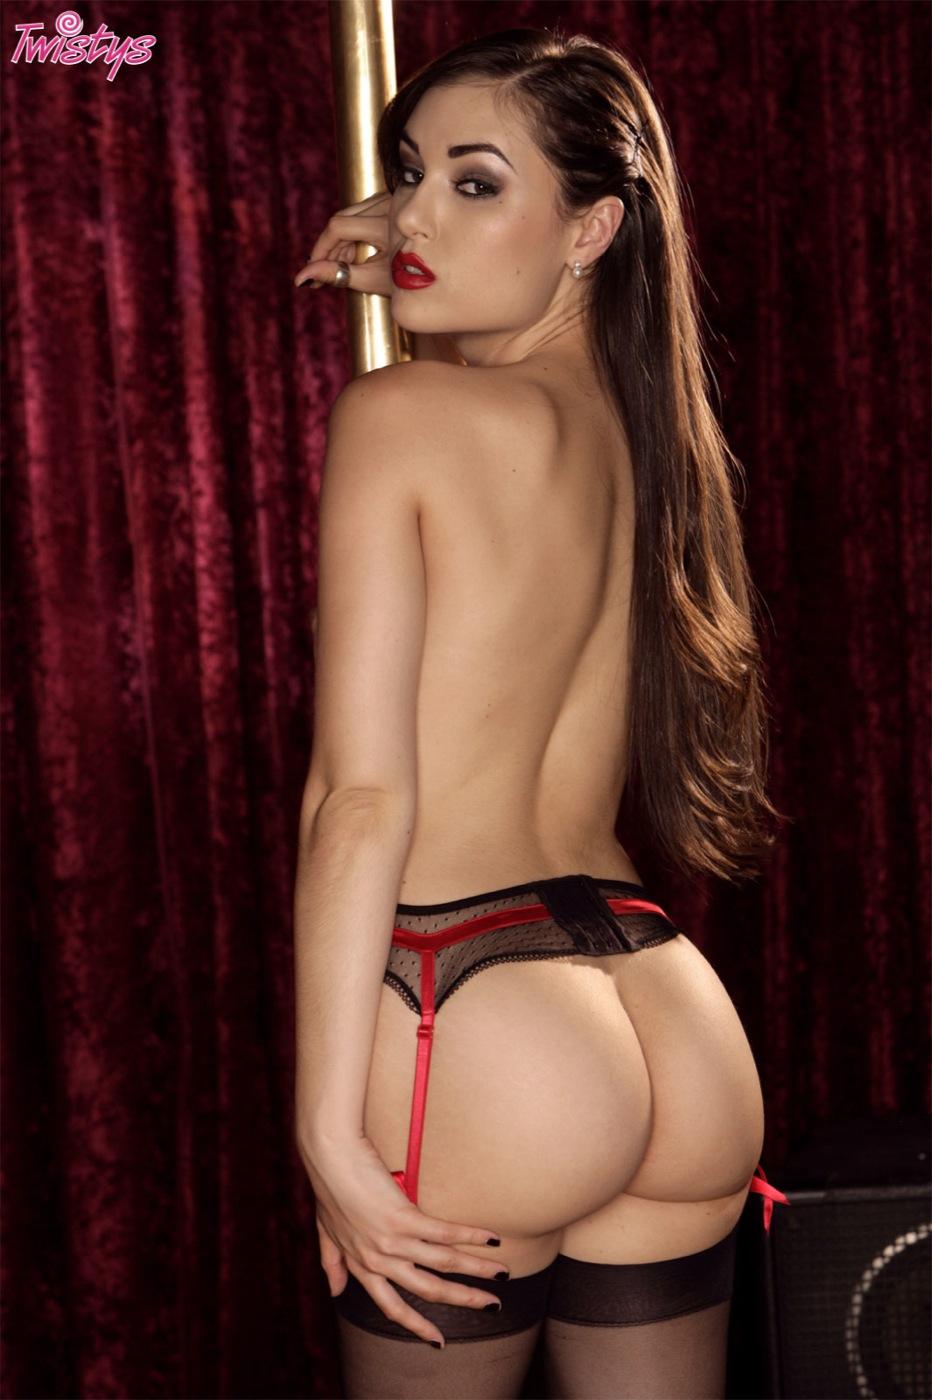 http://1.bp.blogspot.com/-_2VuKBcVnrM/UOvwbeHz79I/AAAAAAAAADQ/DgLhZkGcqtI/s1600/0012-sasha_grey_00394_12.jpg